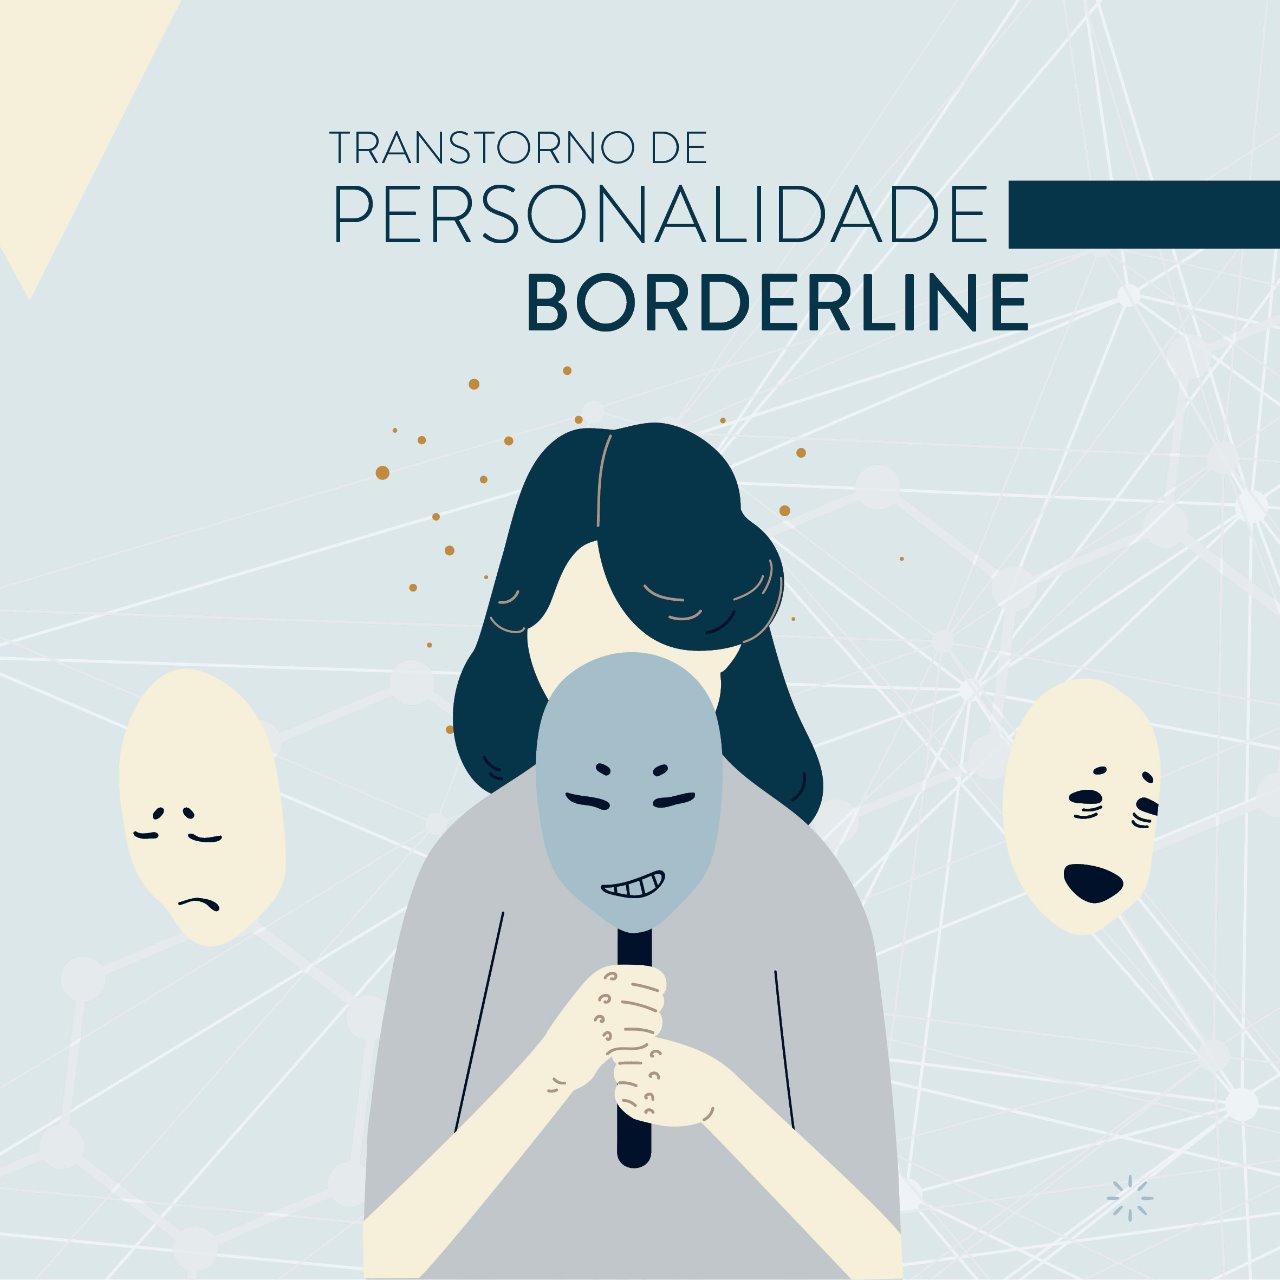 Transtorno de Personalidade Borderline: o que é?